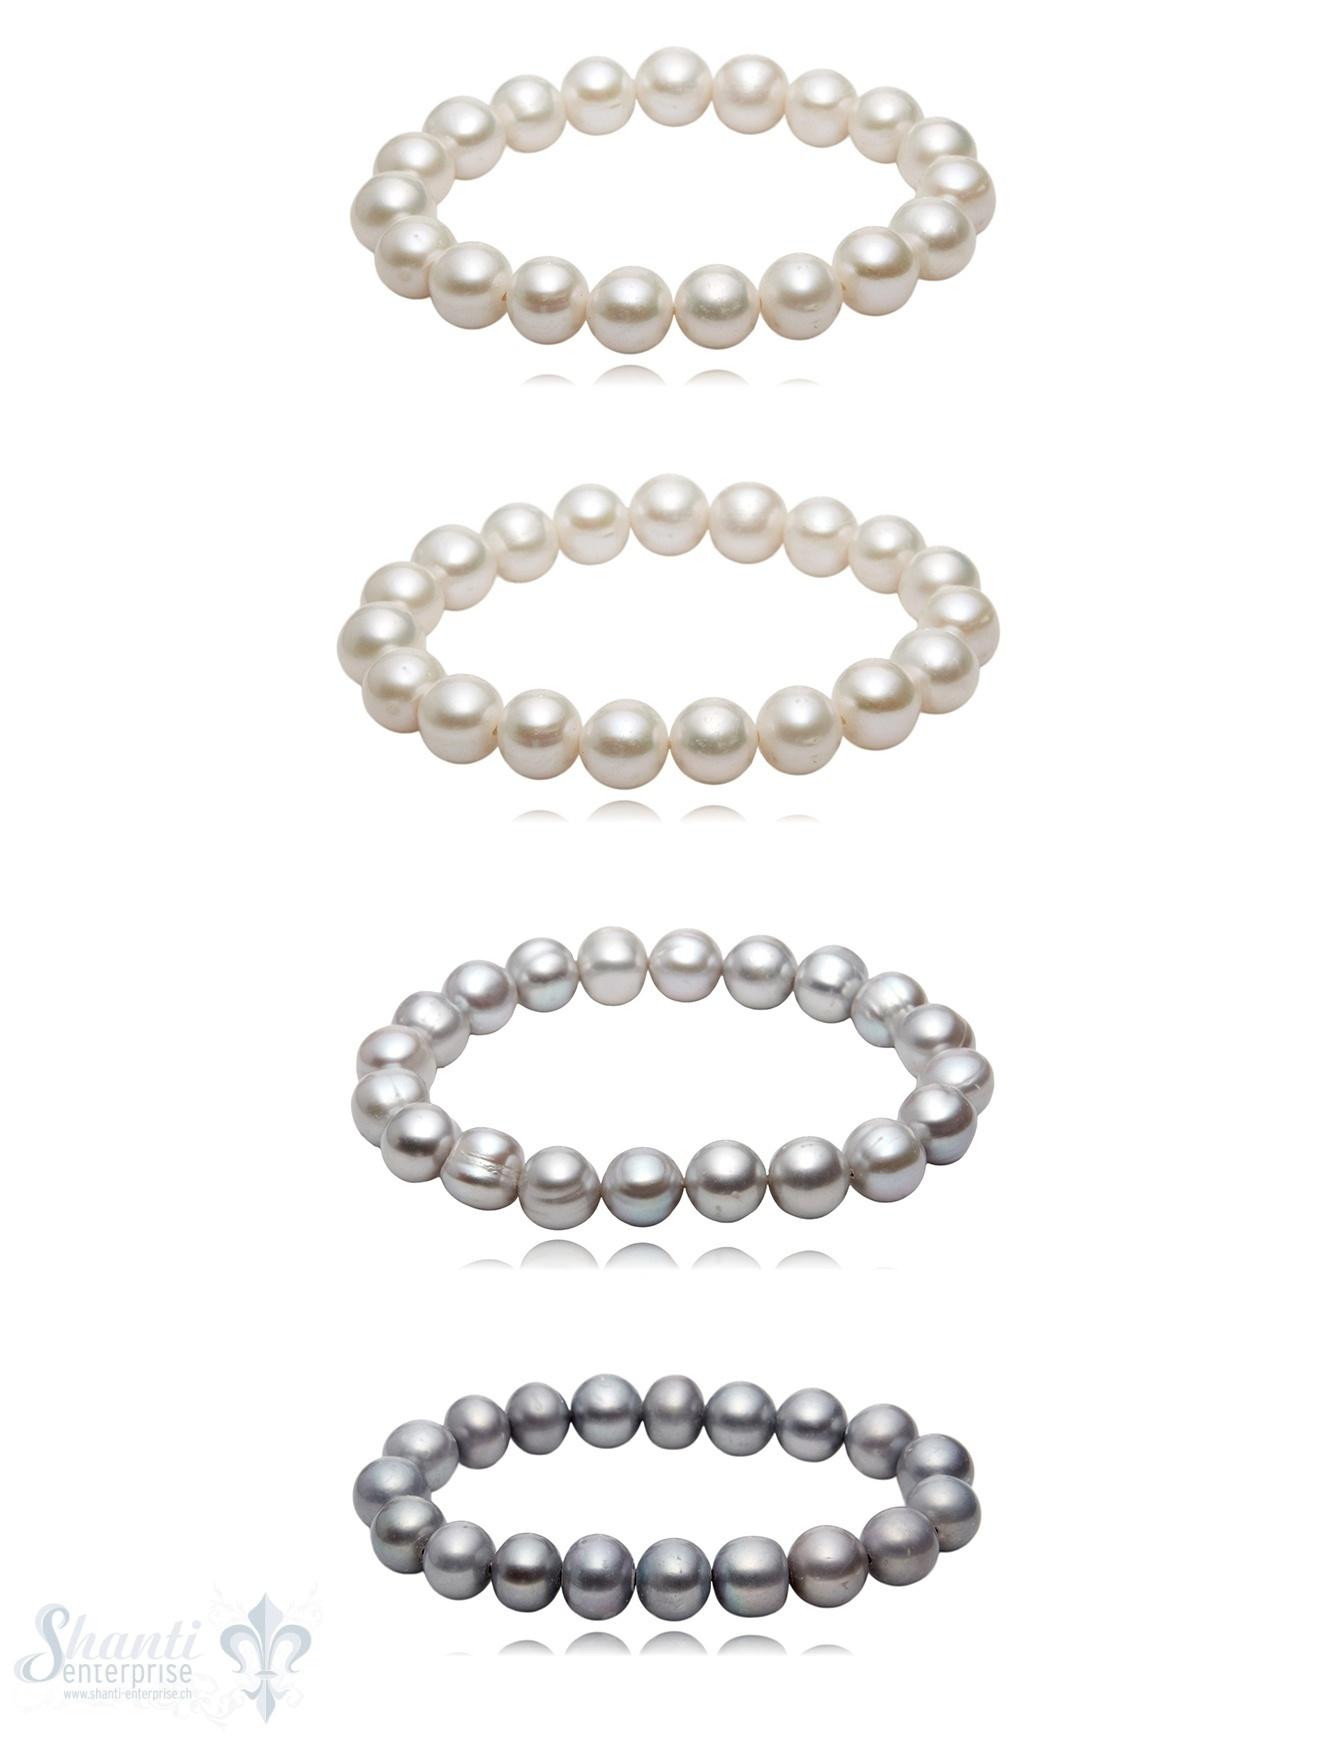 10-12 mm Perlen Armband barock auf Elastik 19 cm